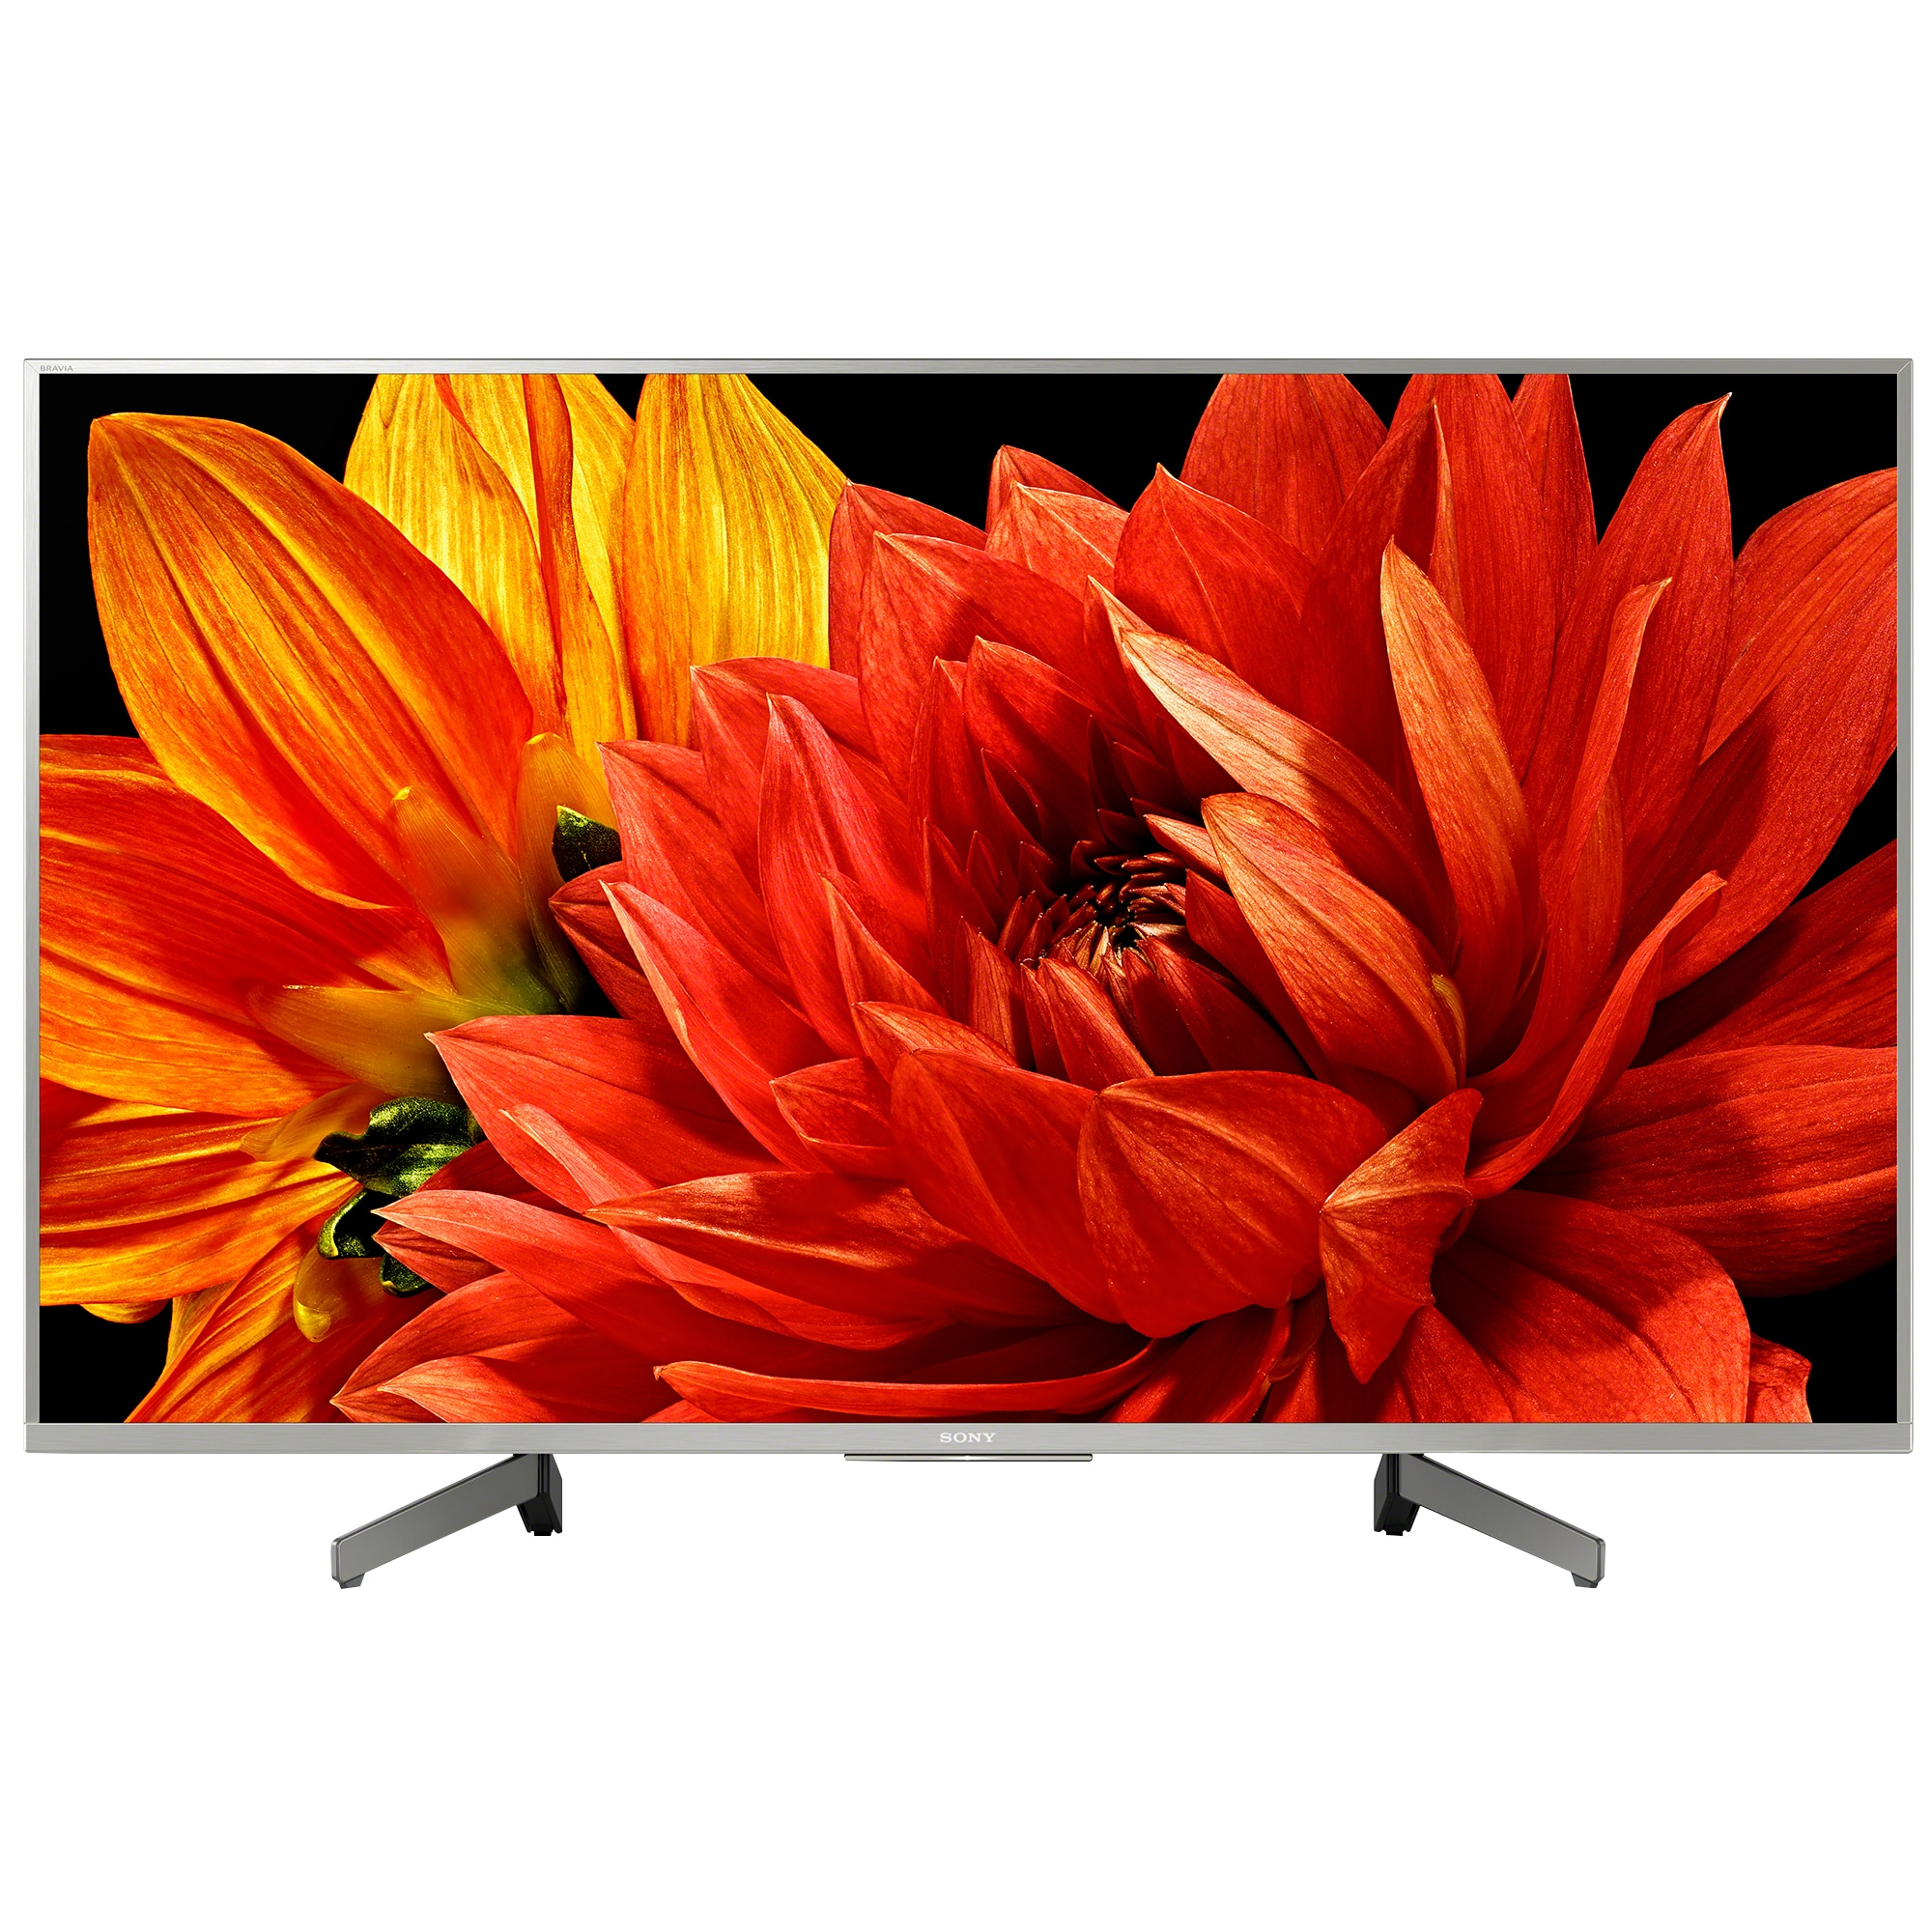 Fotografie Televizor Smart Android LED Sony BRAVIA, 123.2 cm, 49XG8377, 4K Ultra HD